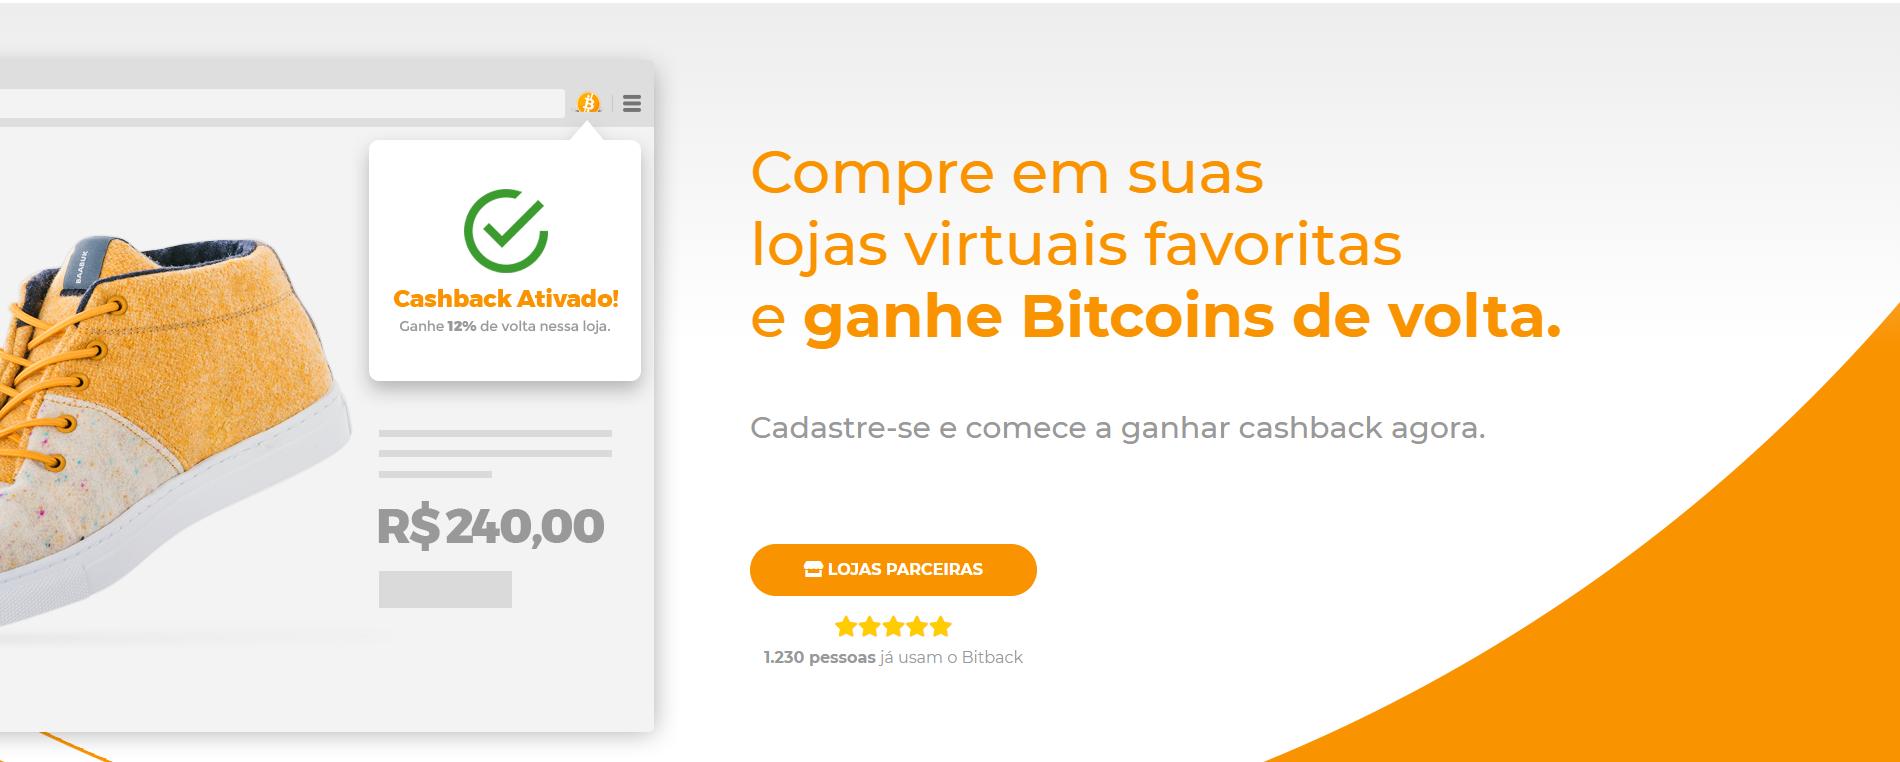 Startup brasileira é a primeira no país a implementar cashback em Bitcoin